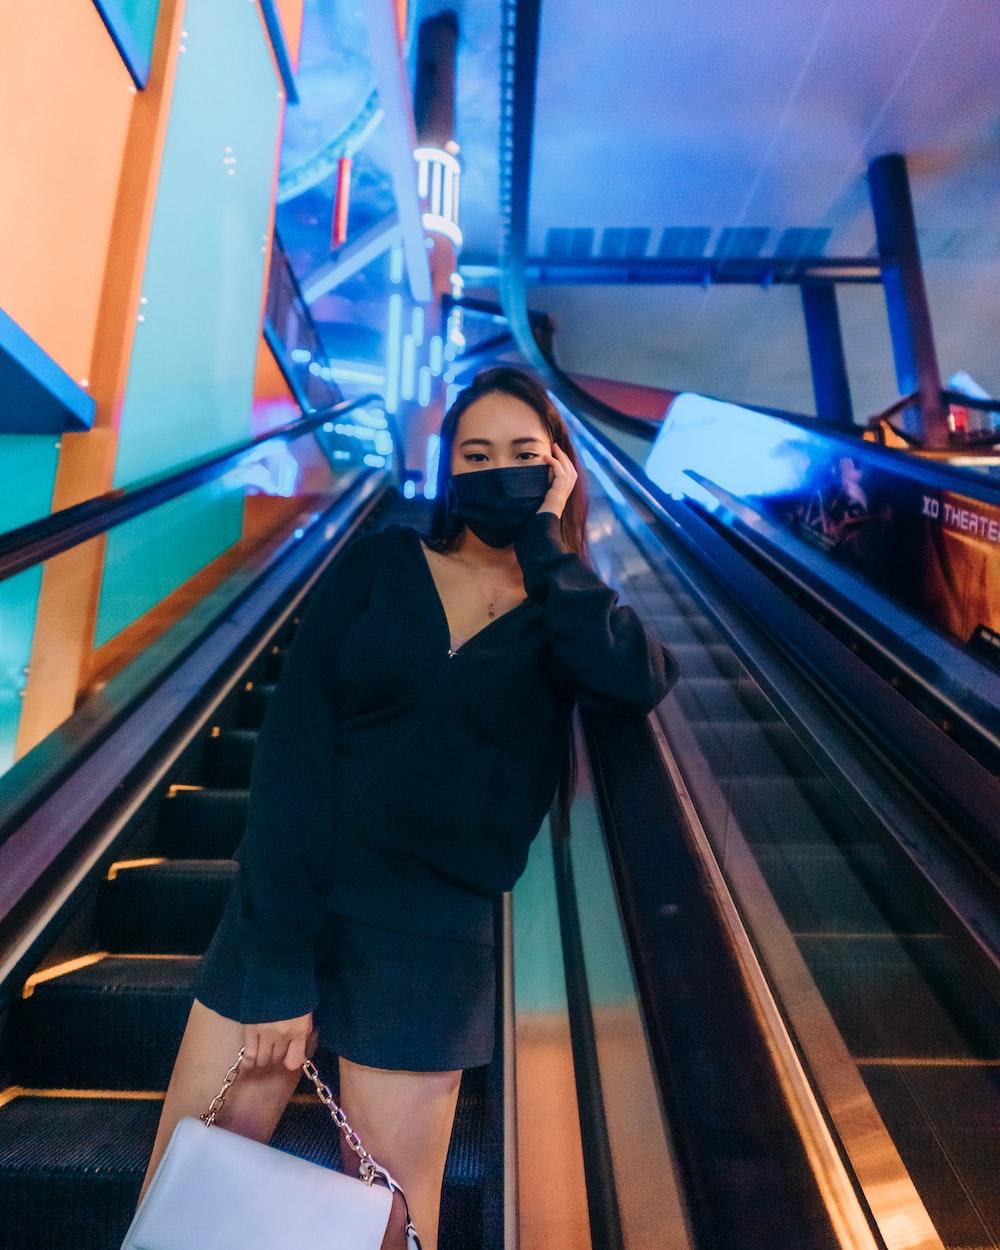 woman in black coat standing on escalator